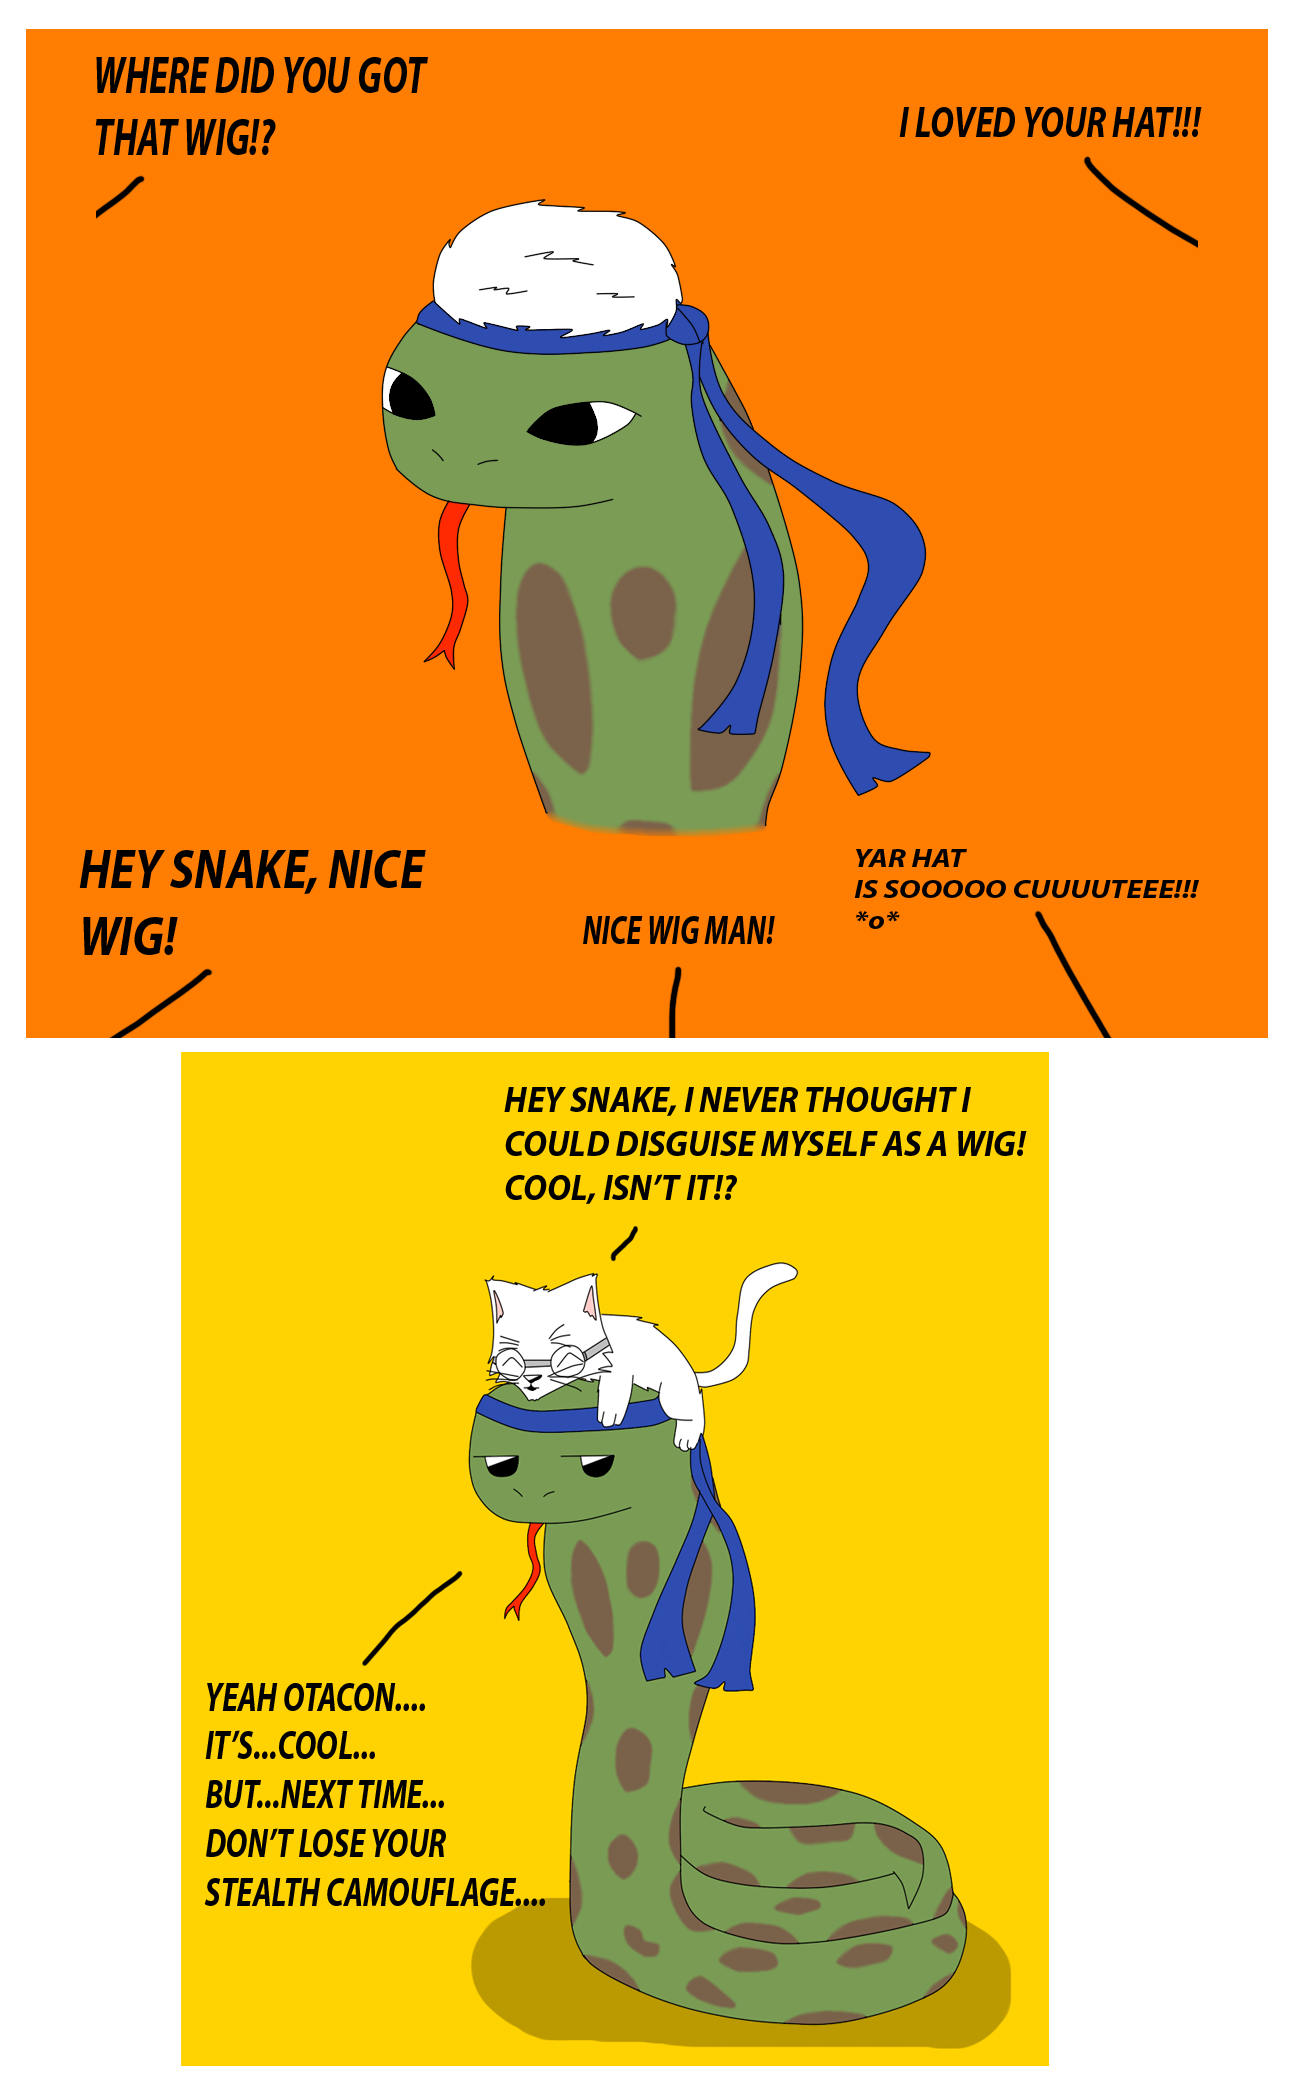 Snake and Otacon